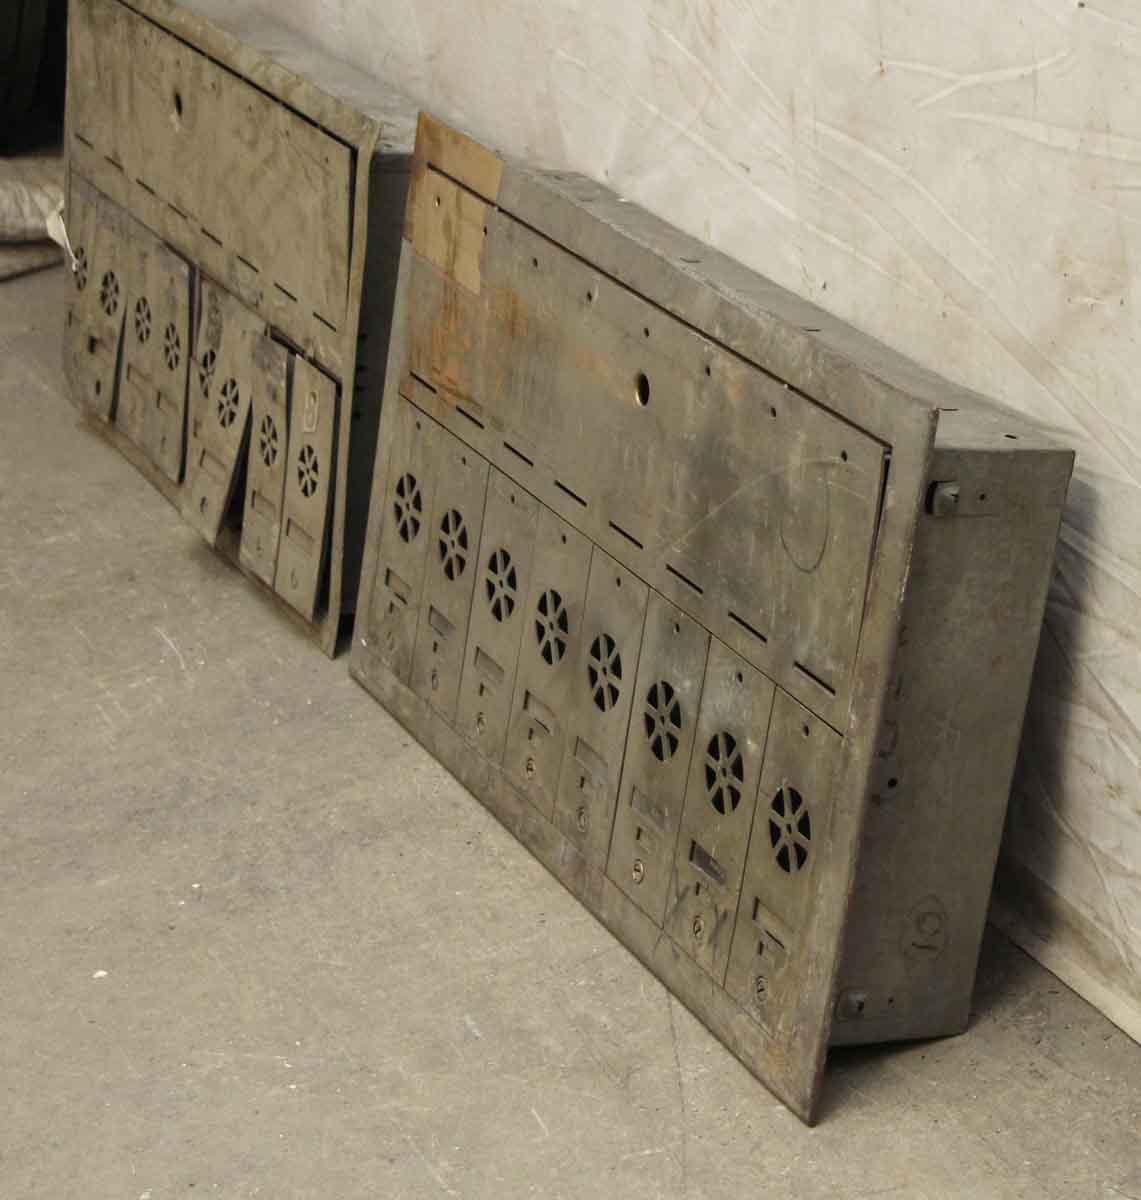 American Furniture Warehouse Mail: Brass Apartment Mailbox Unit